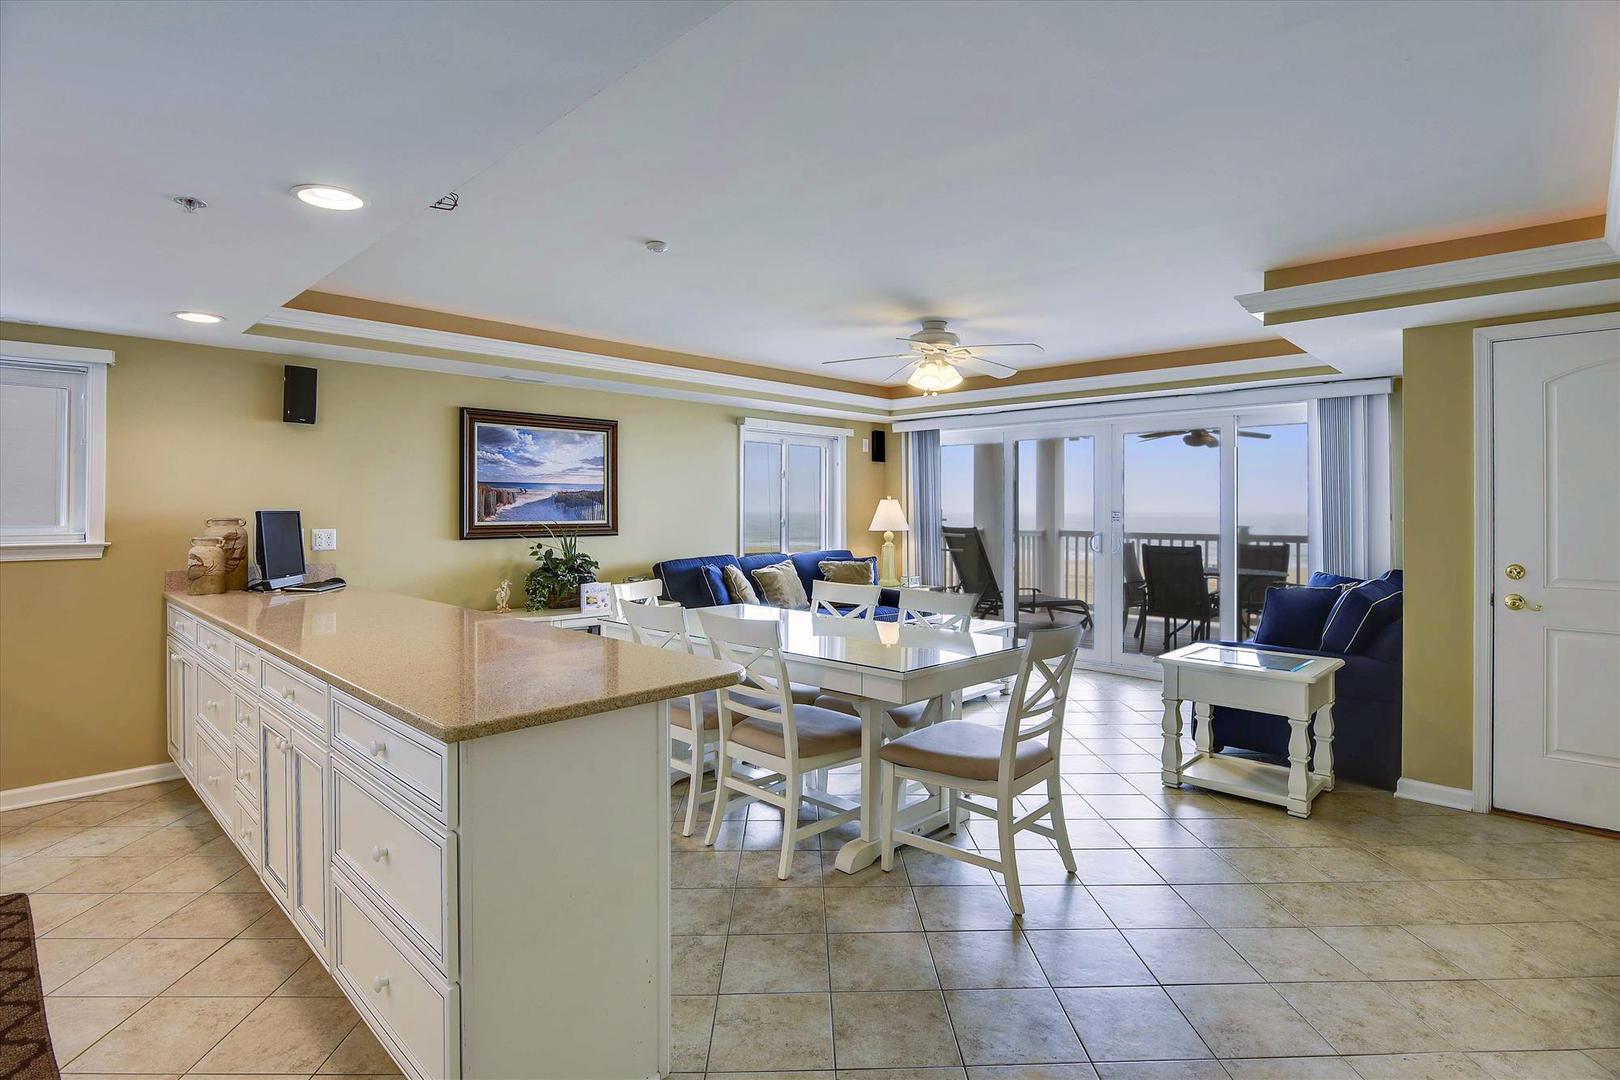 Ocean City Boardwalk Suites N2 - Kitchen